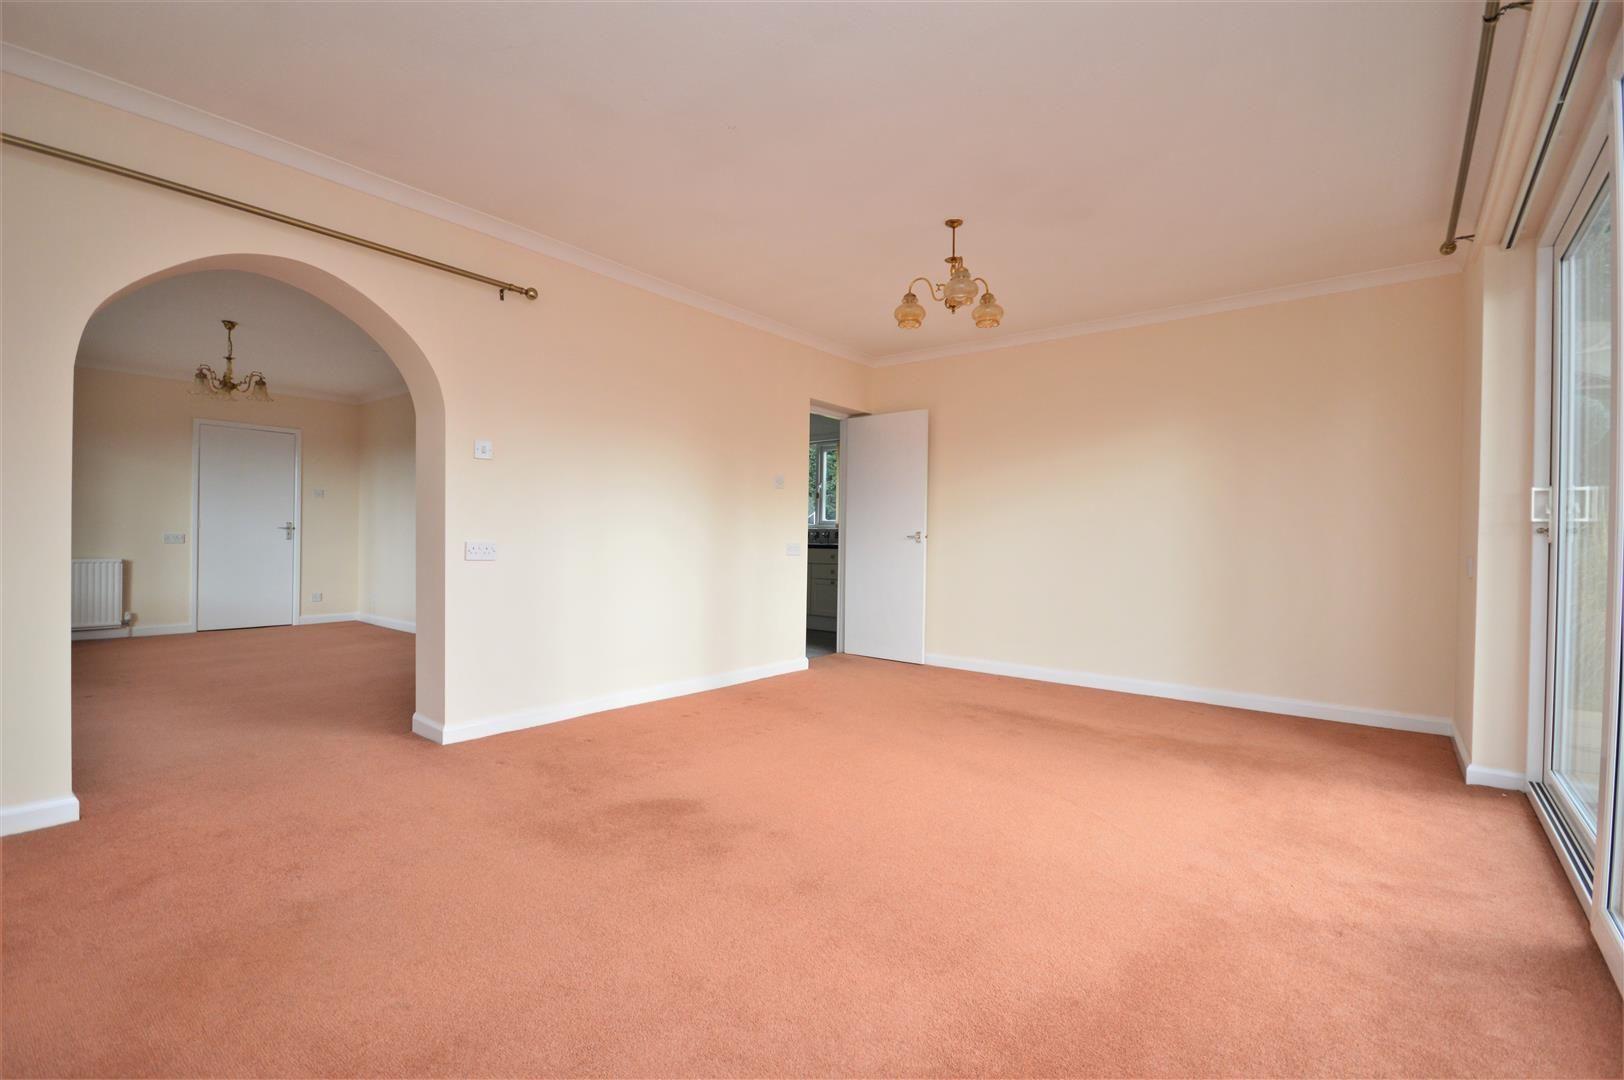 4 bed detached for sale  - Property Image 6